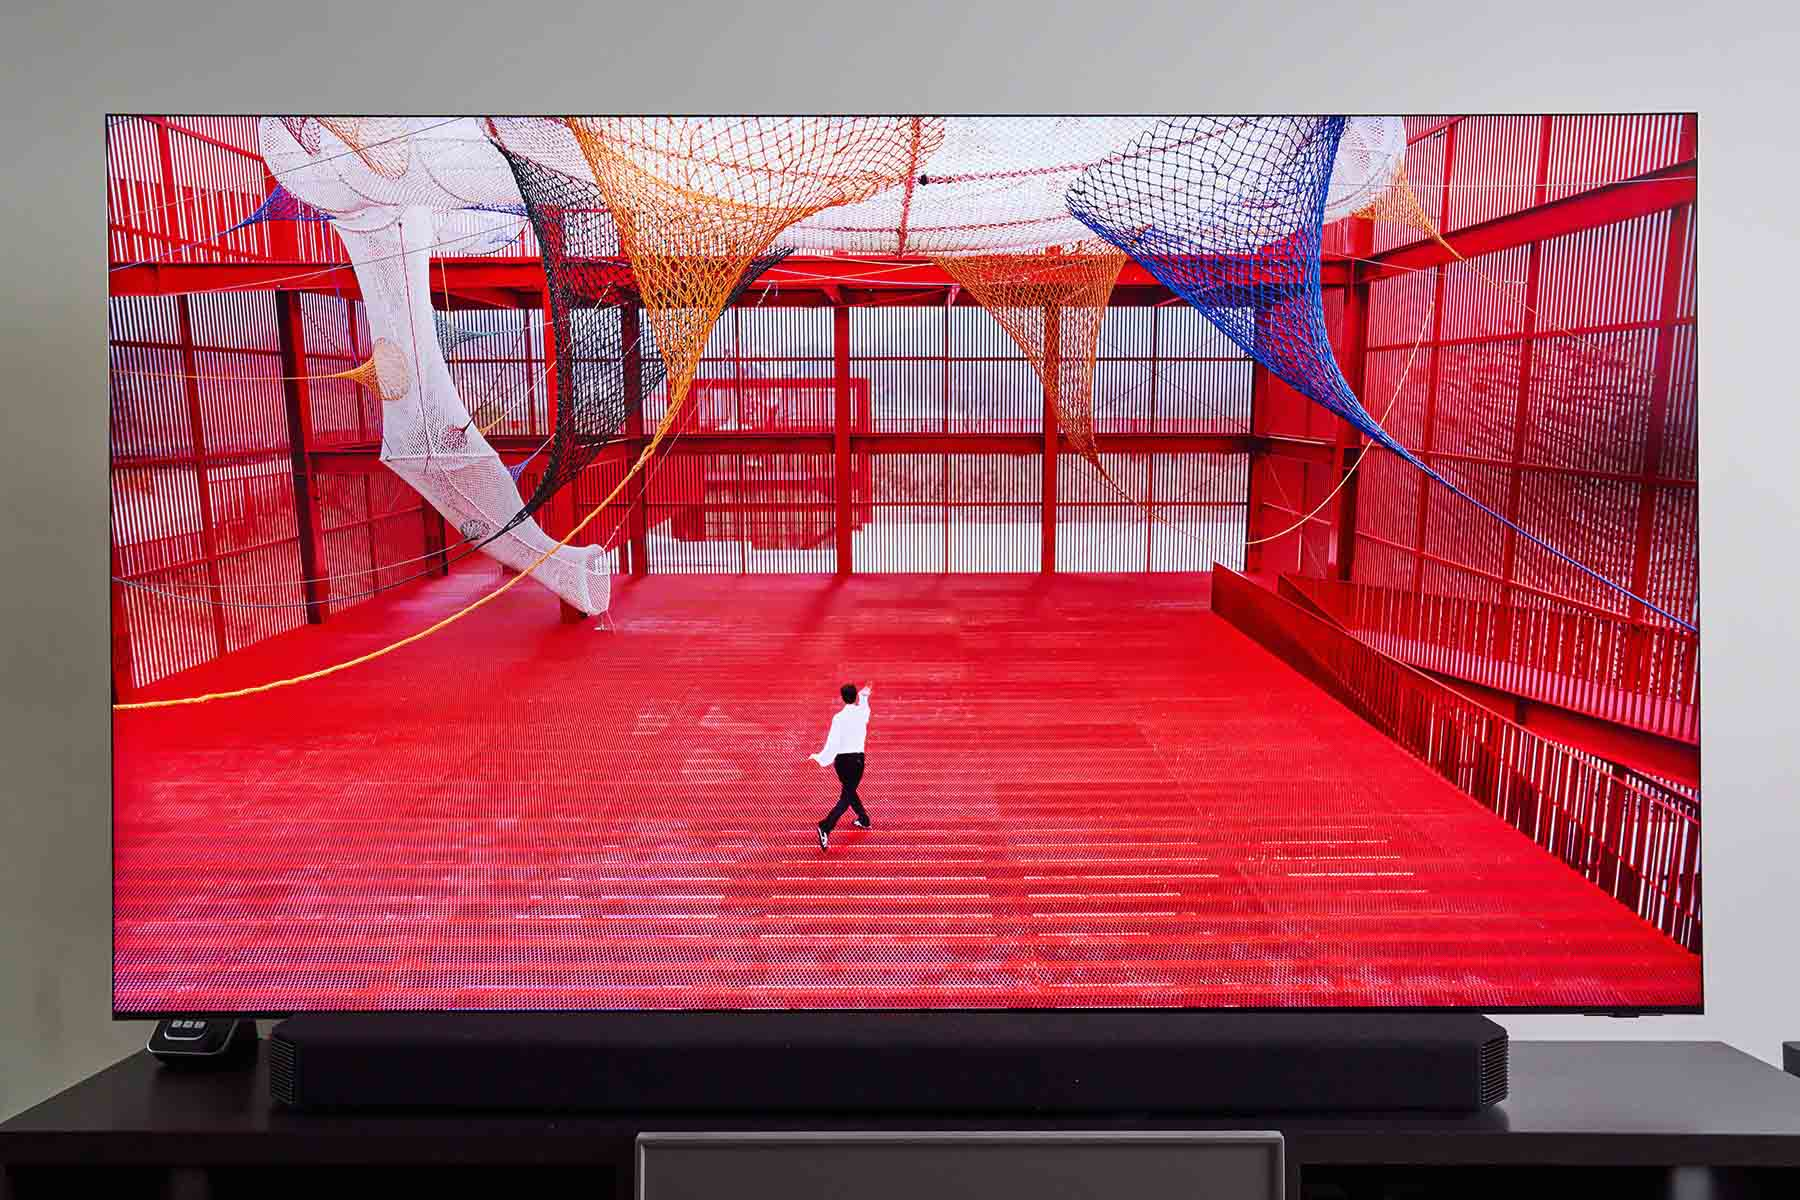 Samsung Neo QLED 8K 量子電視深度解析:嶄新技術讓電視不再是你想像中的電視!